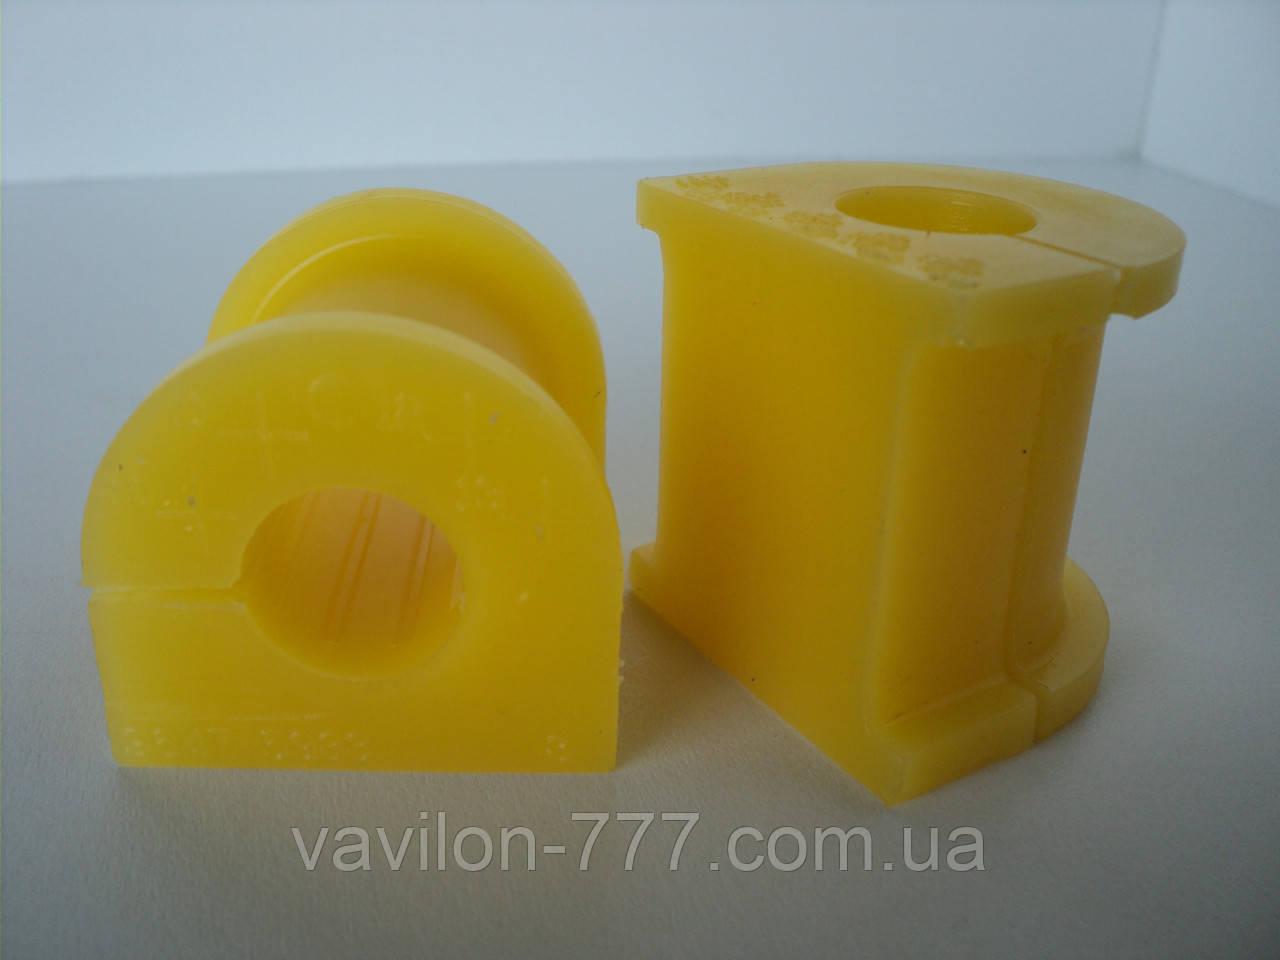 Втулка стабилизатора заднего ID=16 mm EPICA, EVANDA ОЕМ 96475983 полиуретан